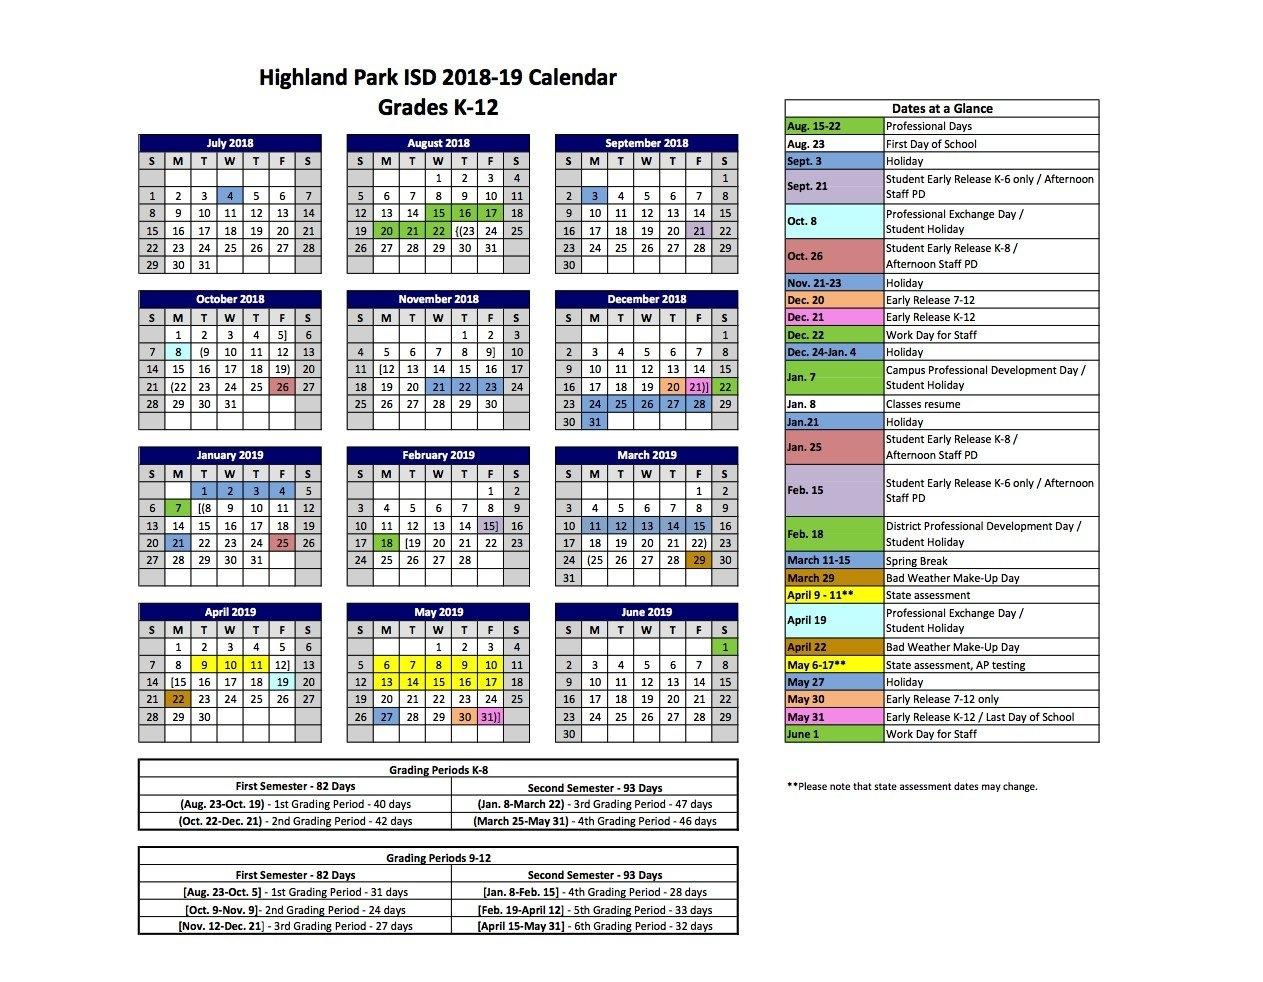 2018-2019 Hpisd Calendars – Calendars – Highland Park Independent Calendar 2019 Hisd